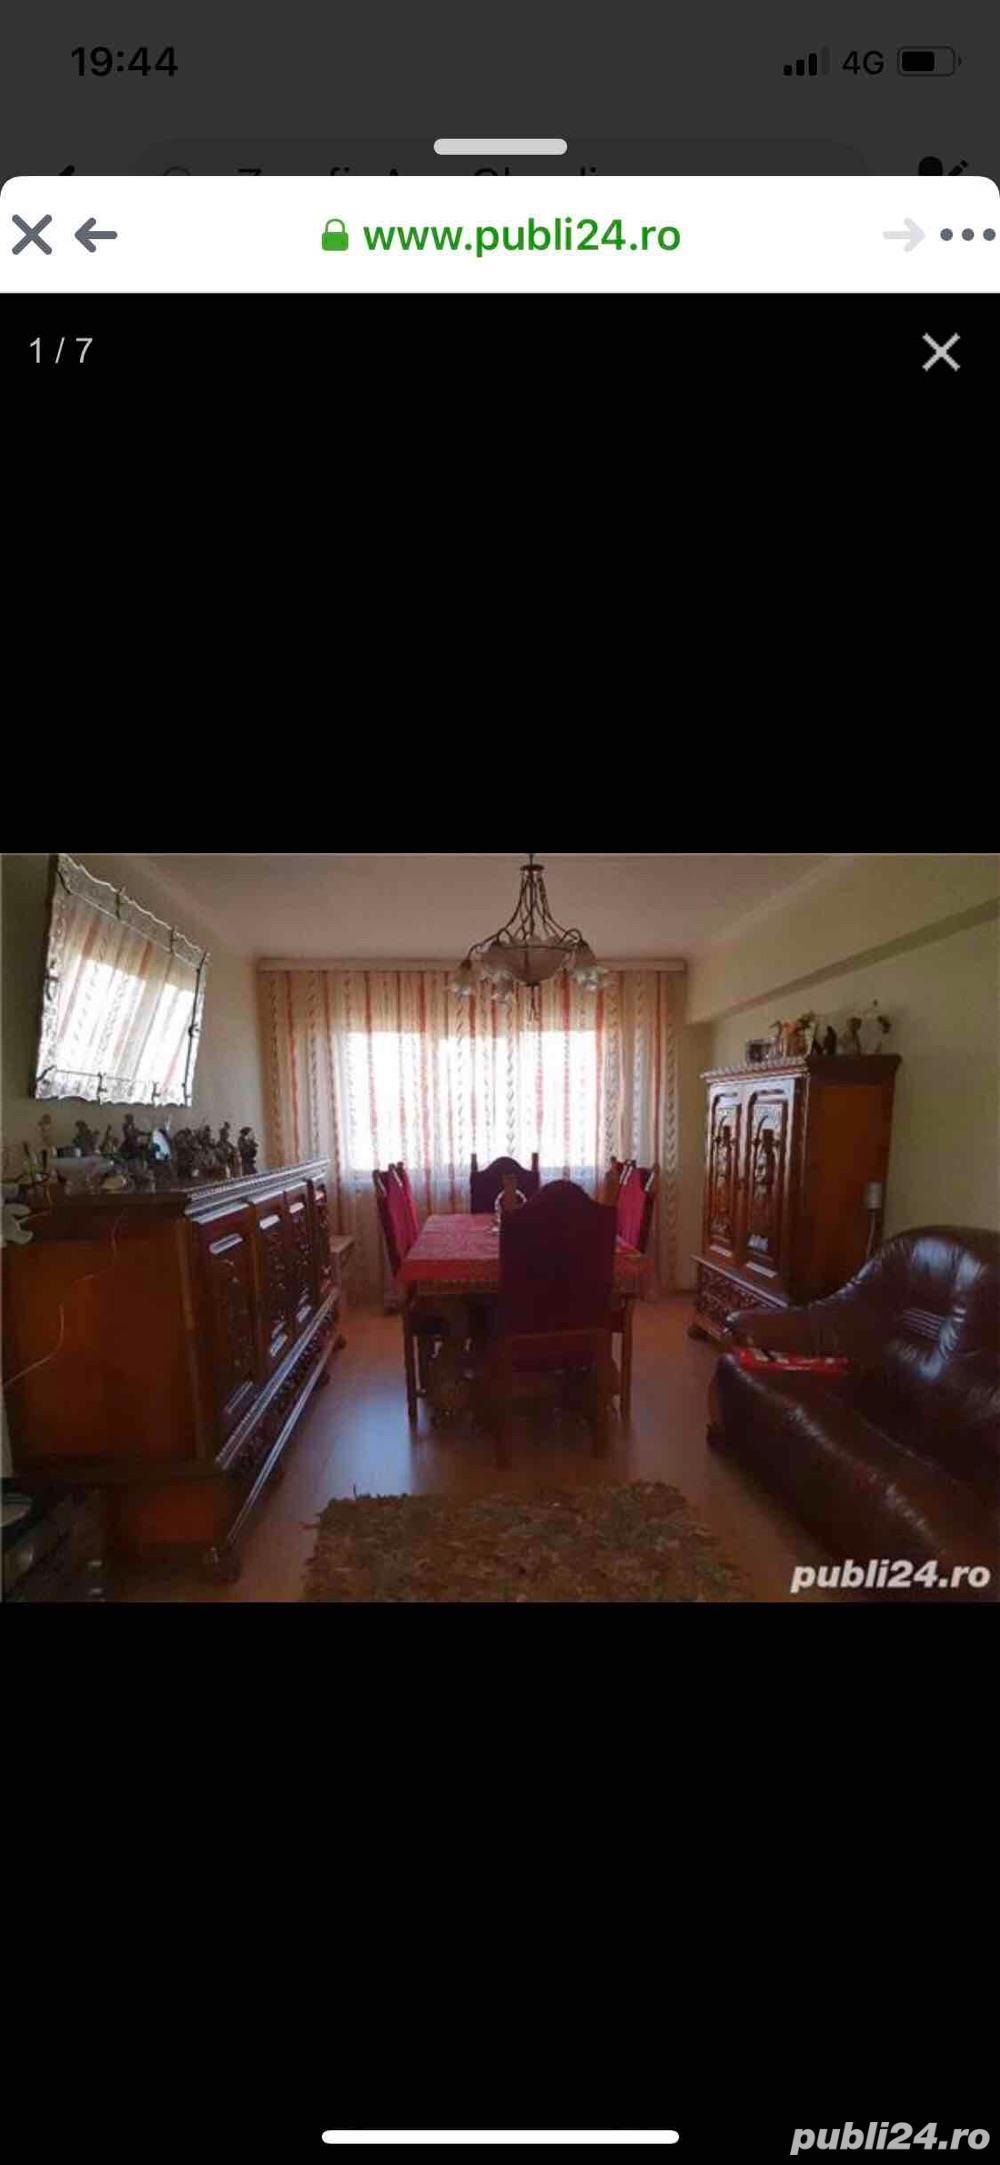 PROPRIETAR, vand apartament 4 camere in PITESTI !!